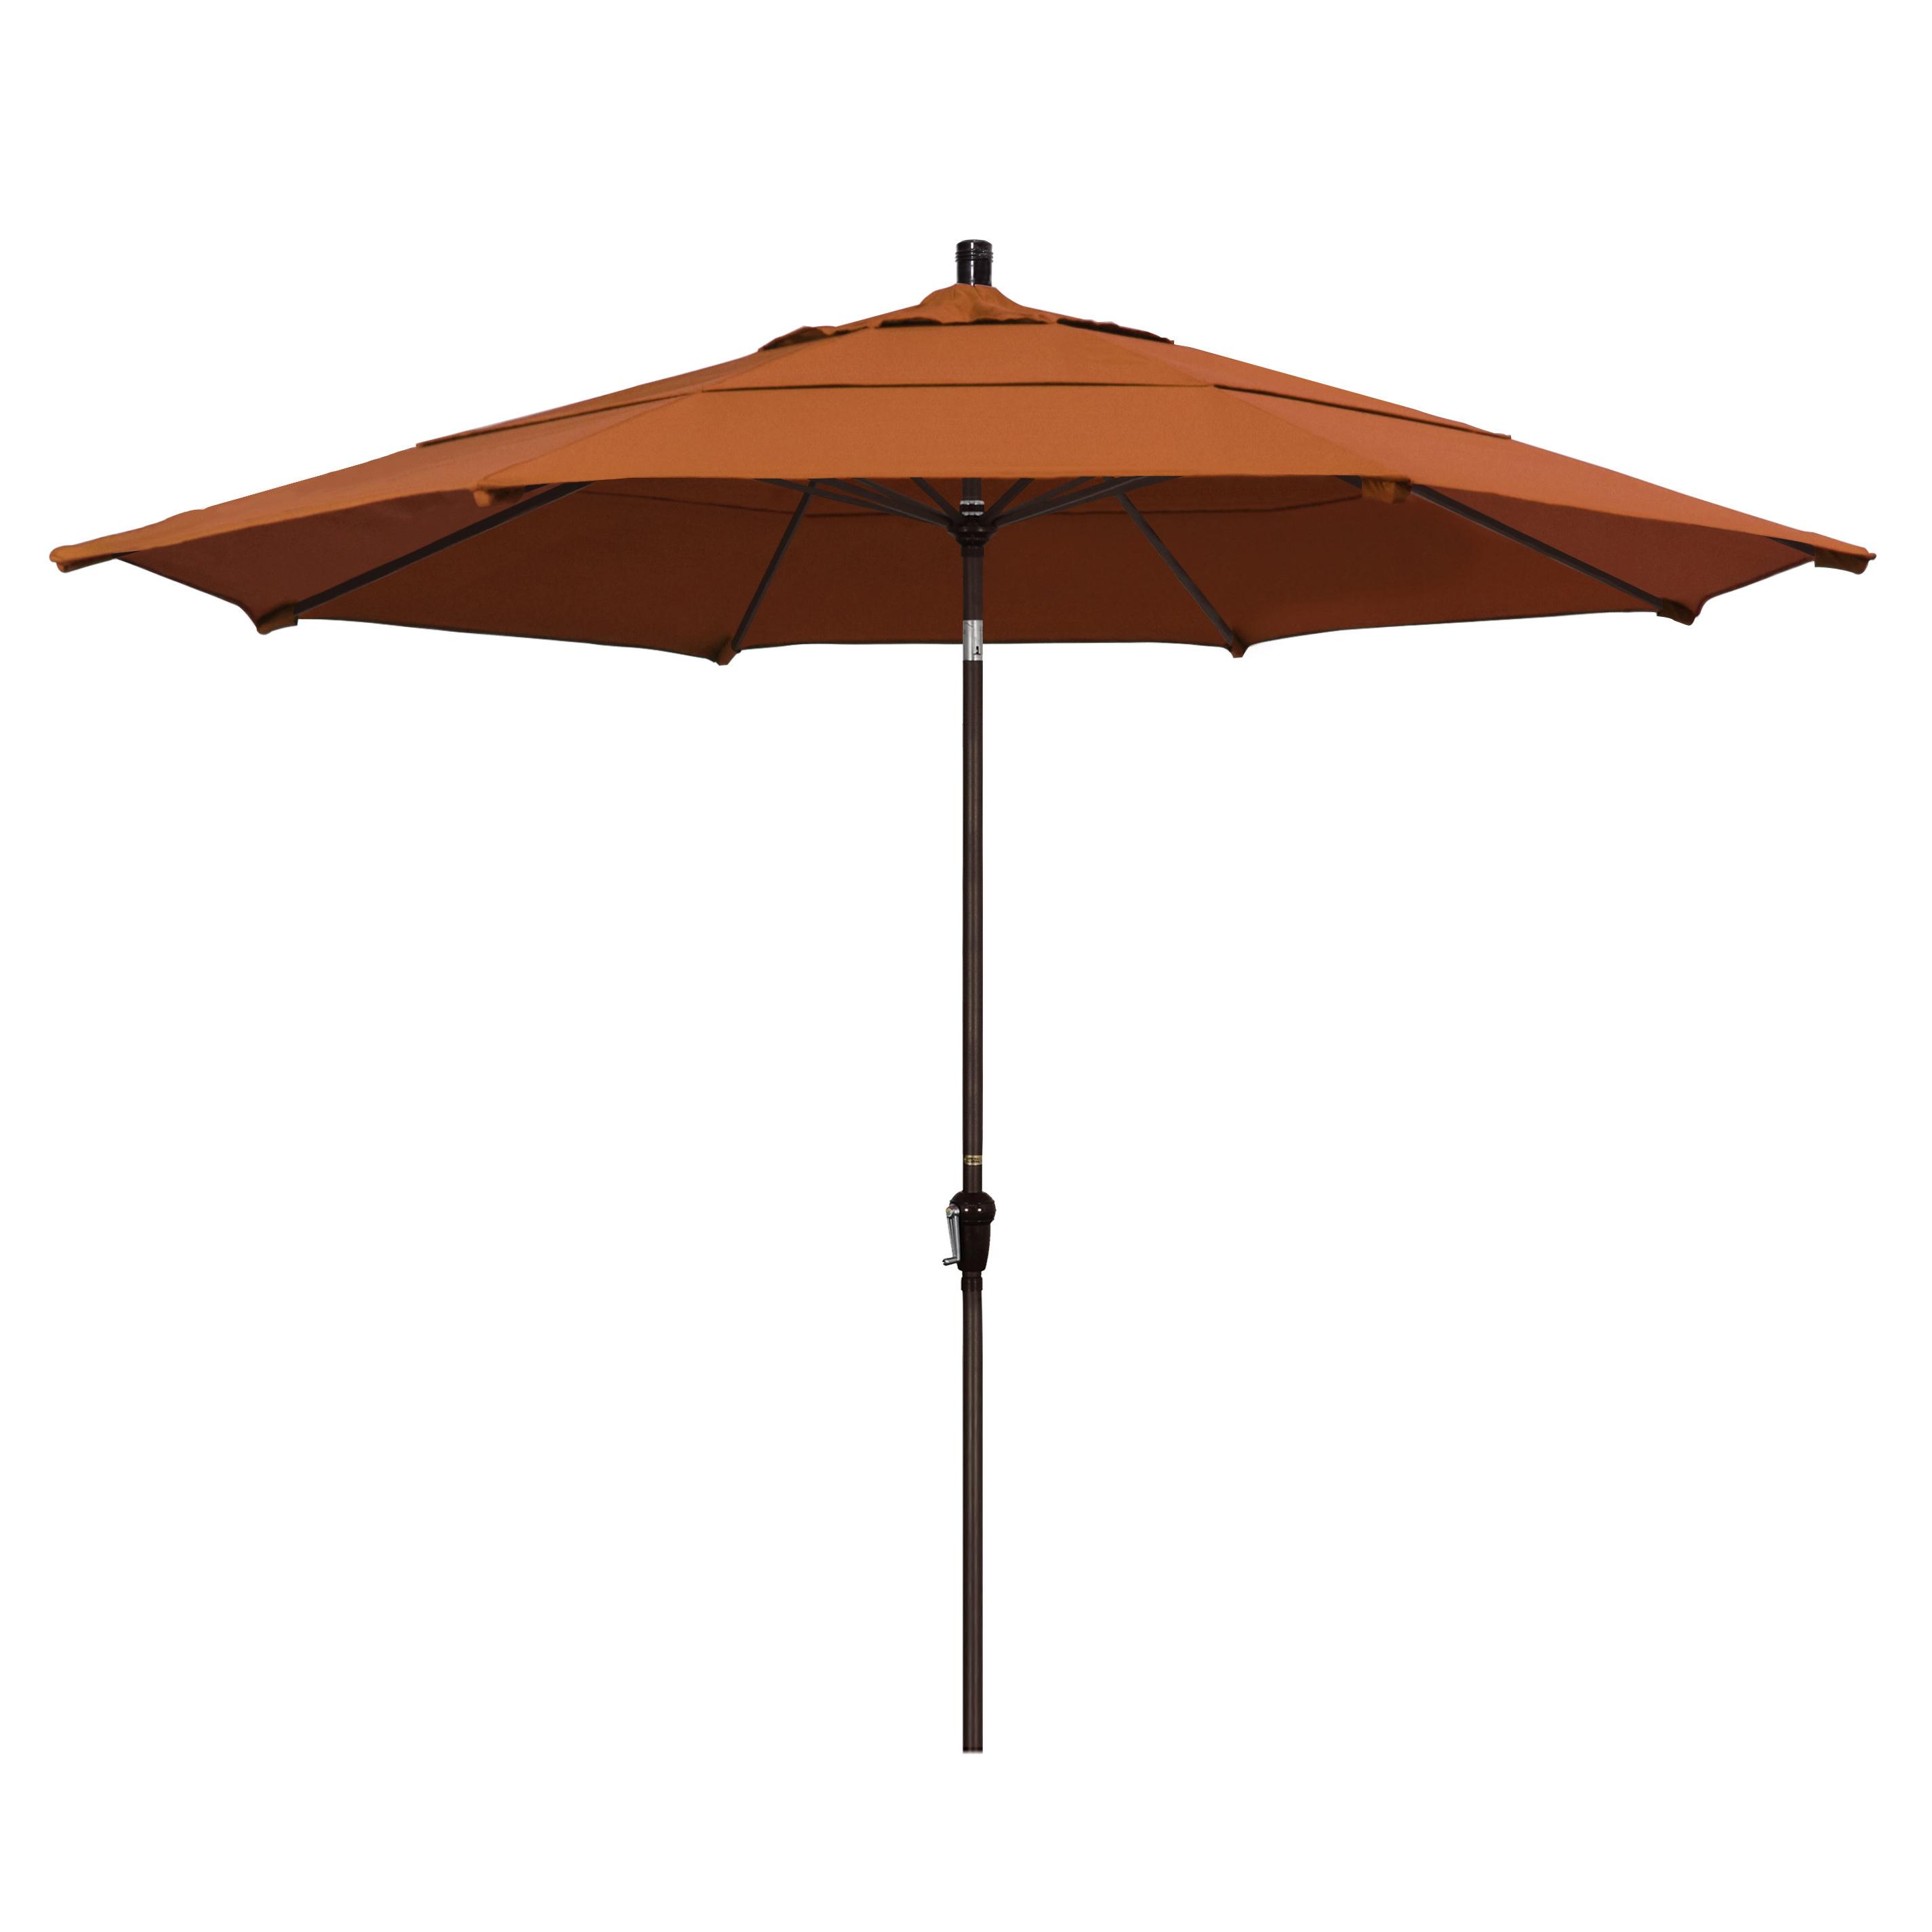 Popular Mullaney 11' Market Sunbrella Umbrella With Carlton  Rectangular Market Umbrellas (View 17 of 20)